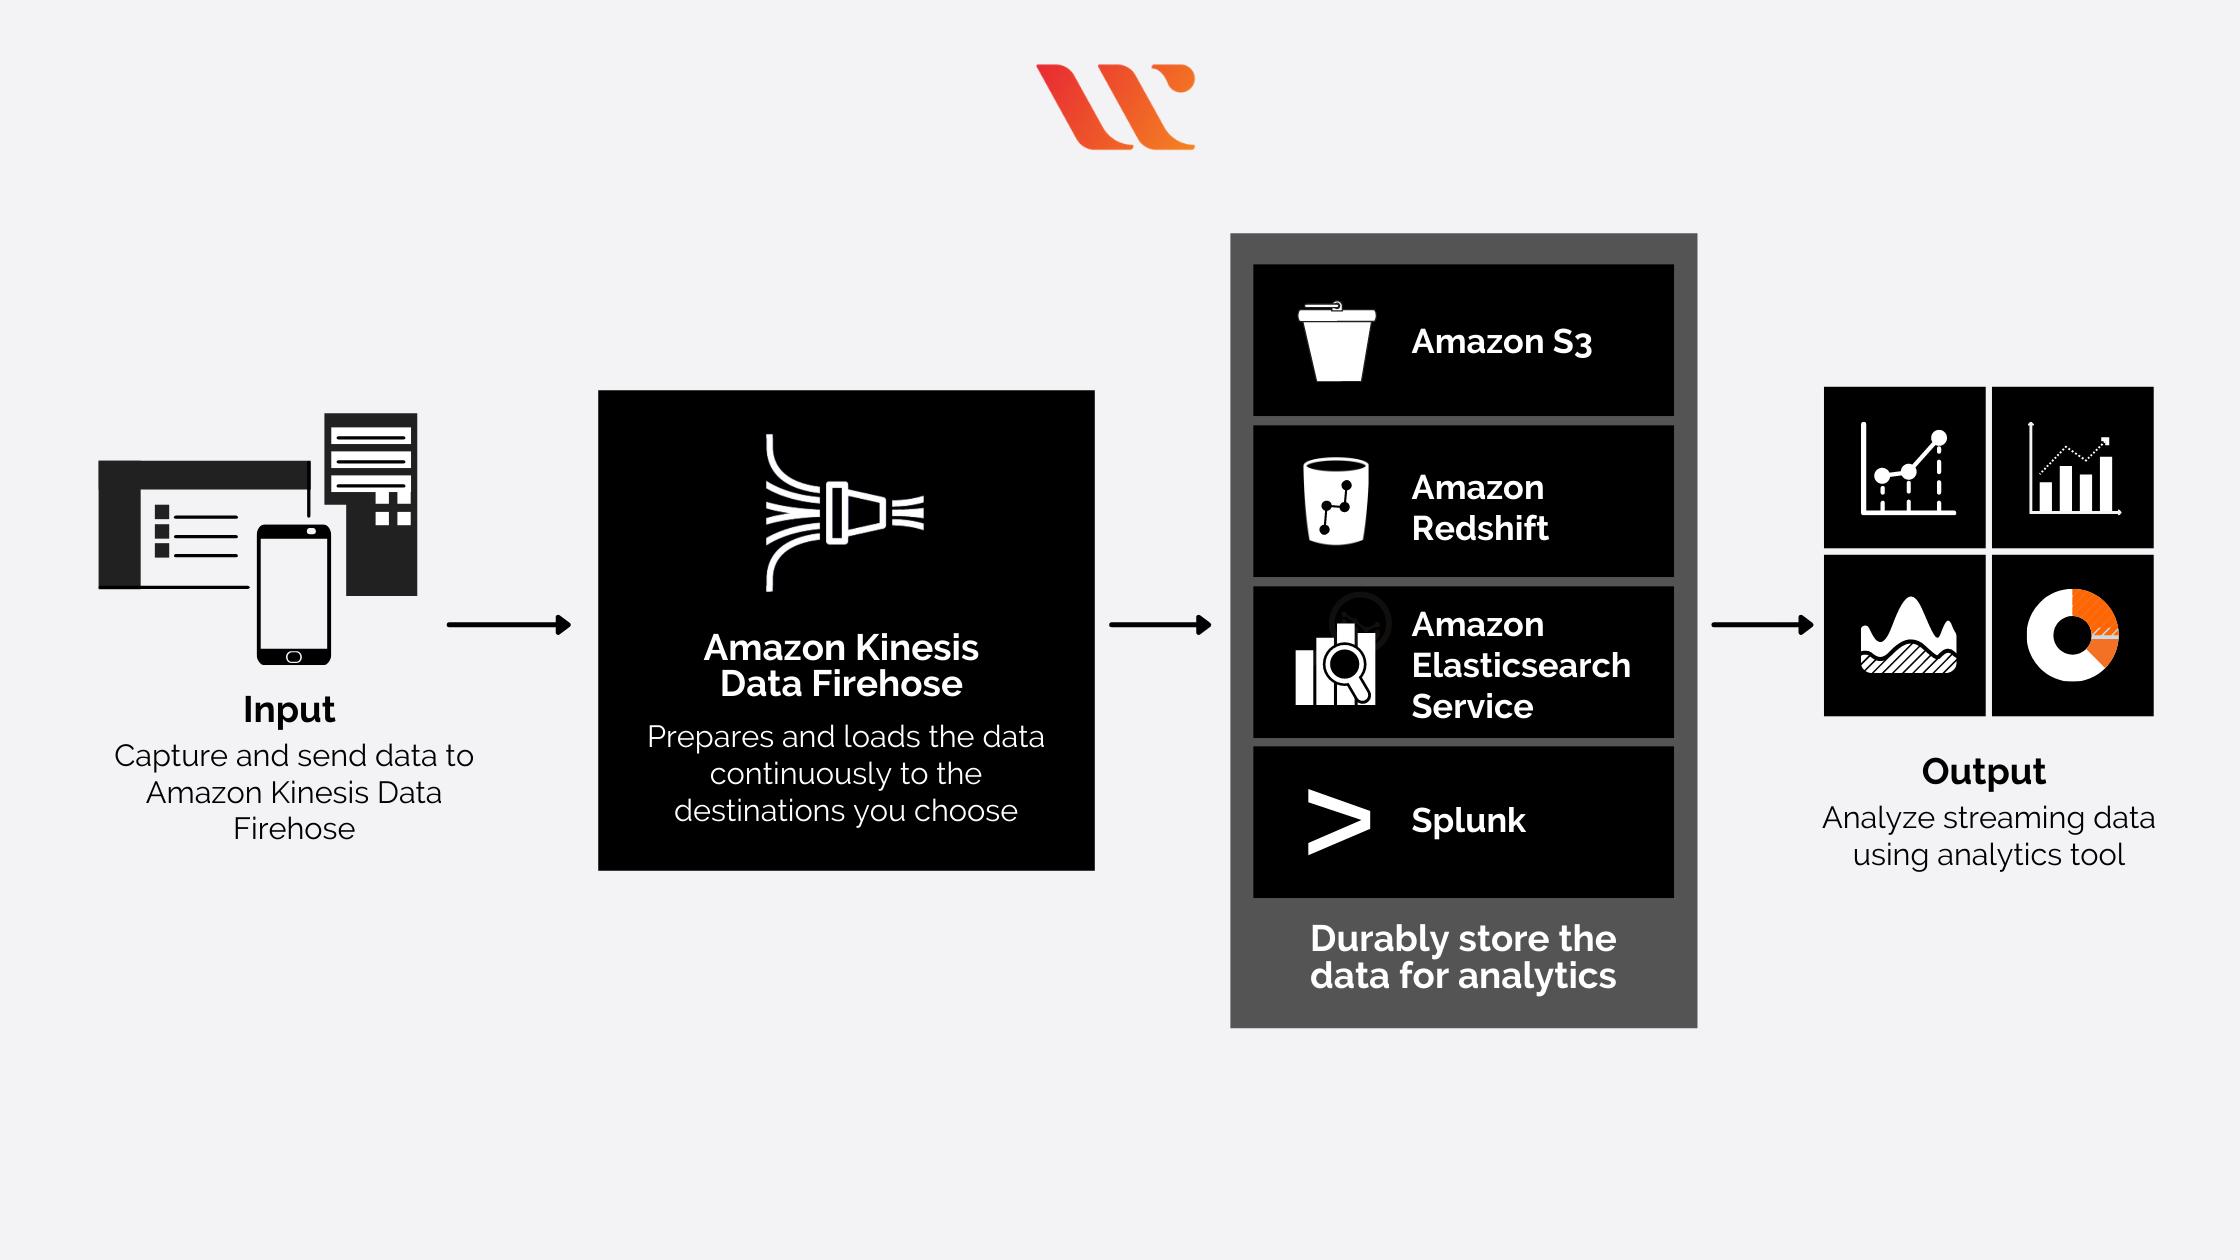 Amazon Kinesis Data Firehose